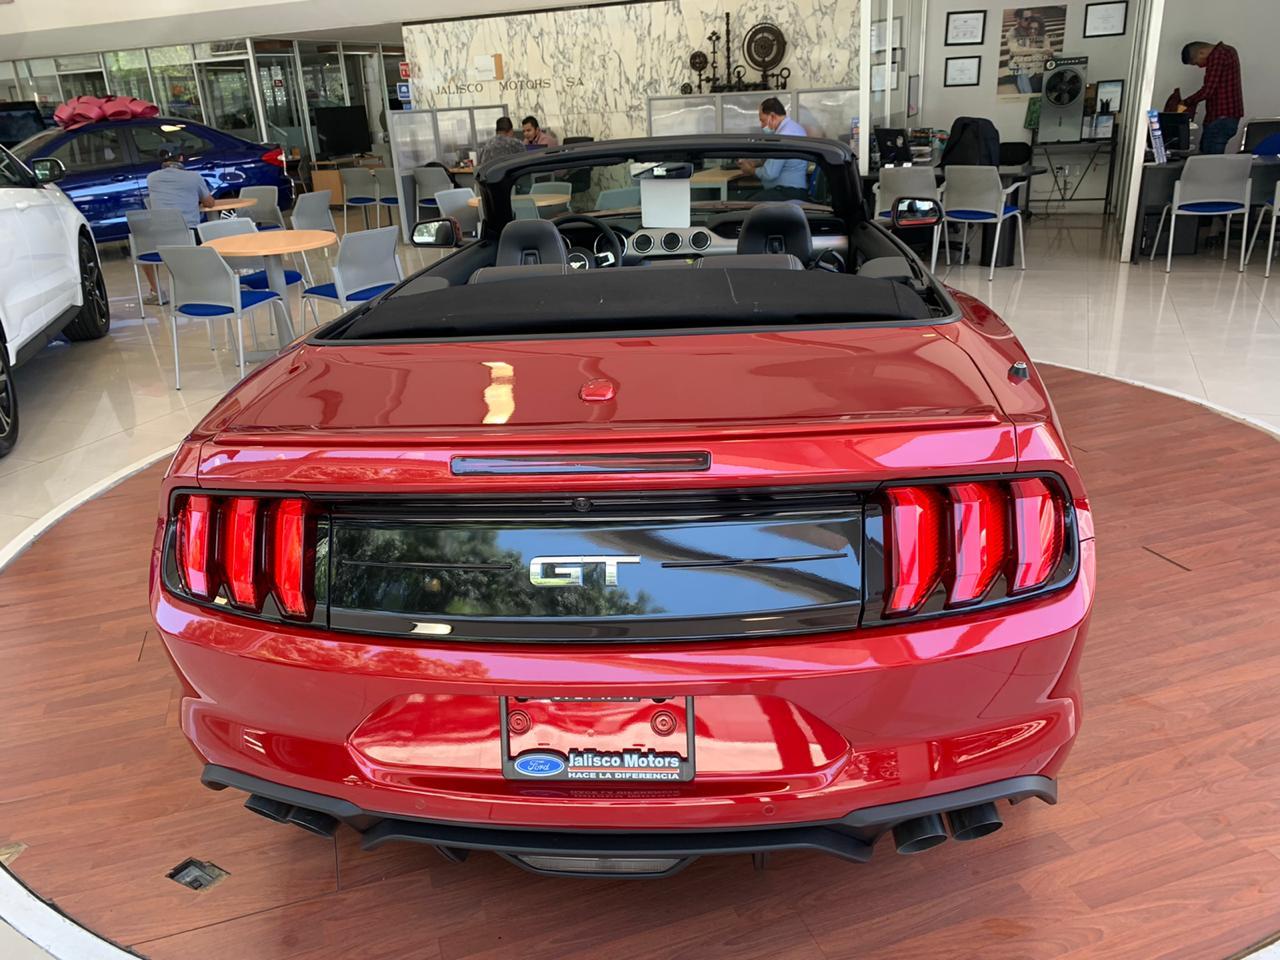 Ford Mustang, 2020 Gt V8 Convertible At lleno